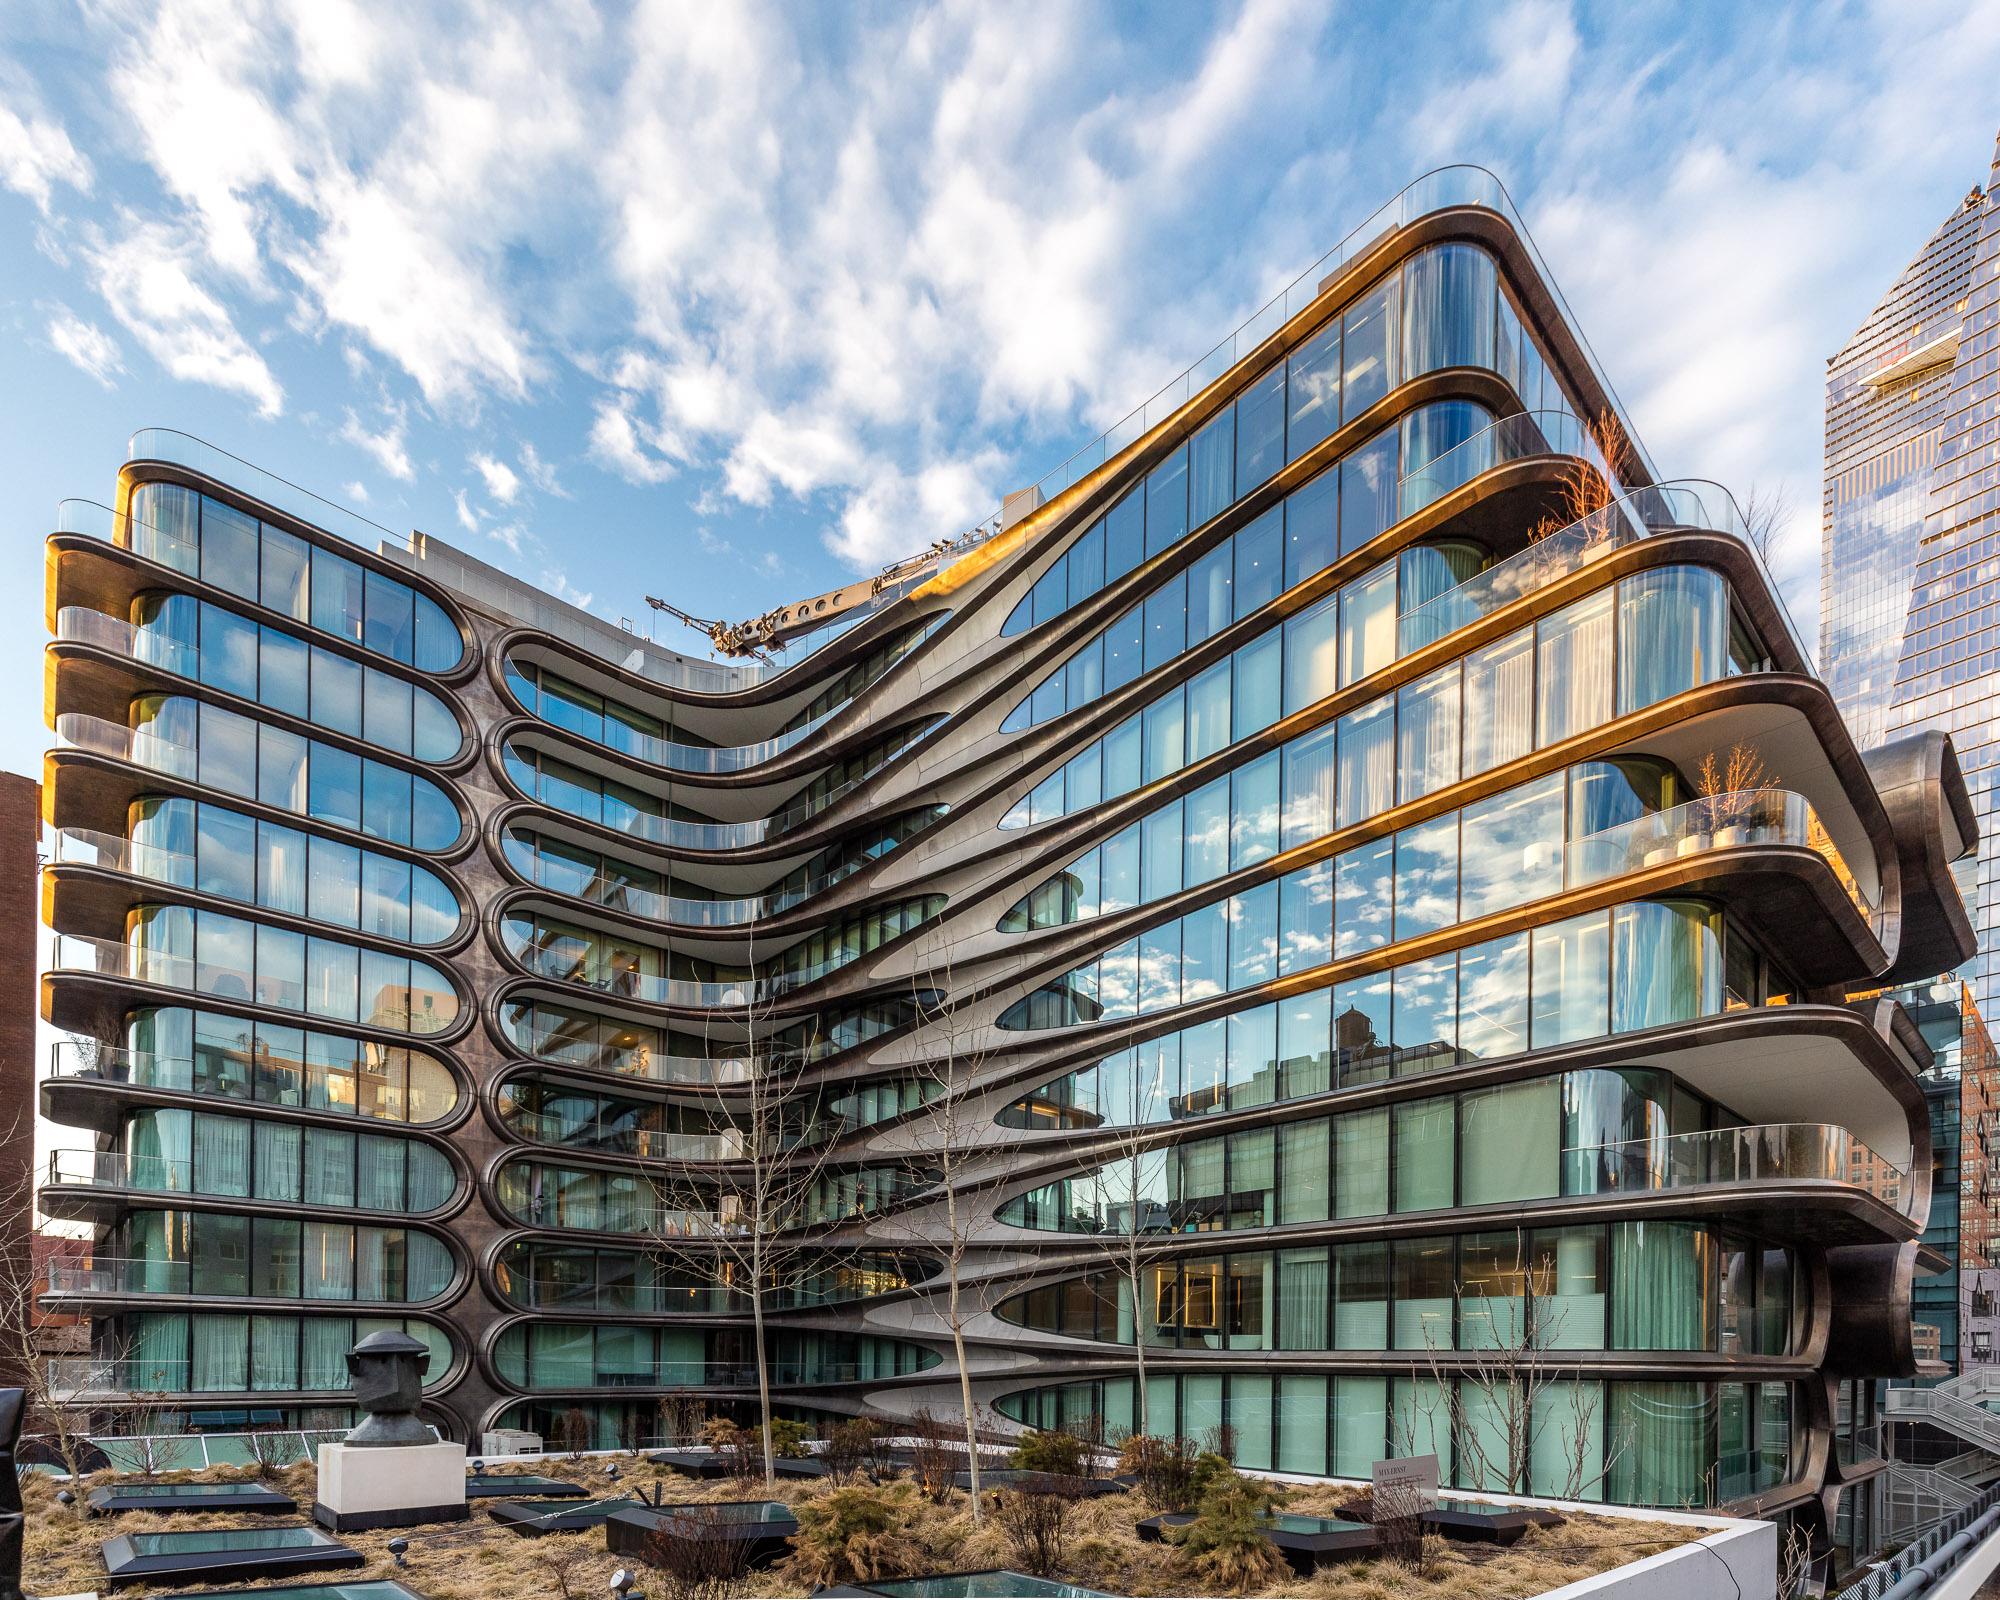 Zaha Hadid's High Line condos linger on the market